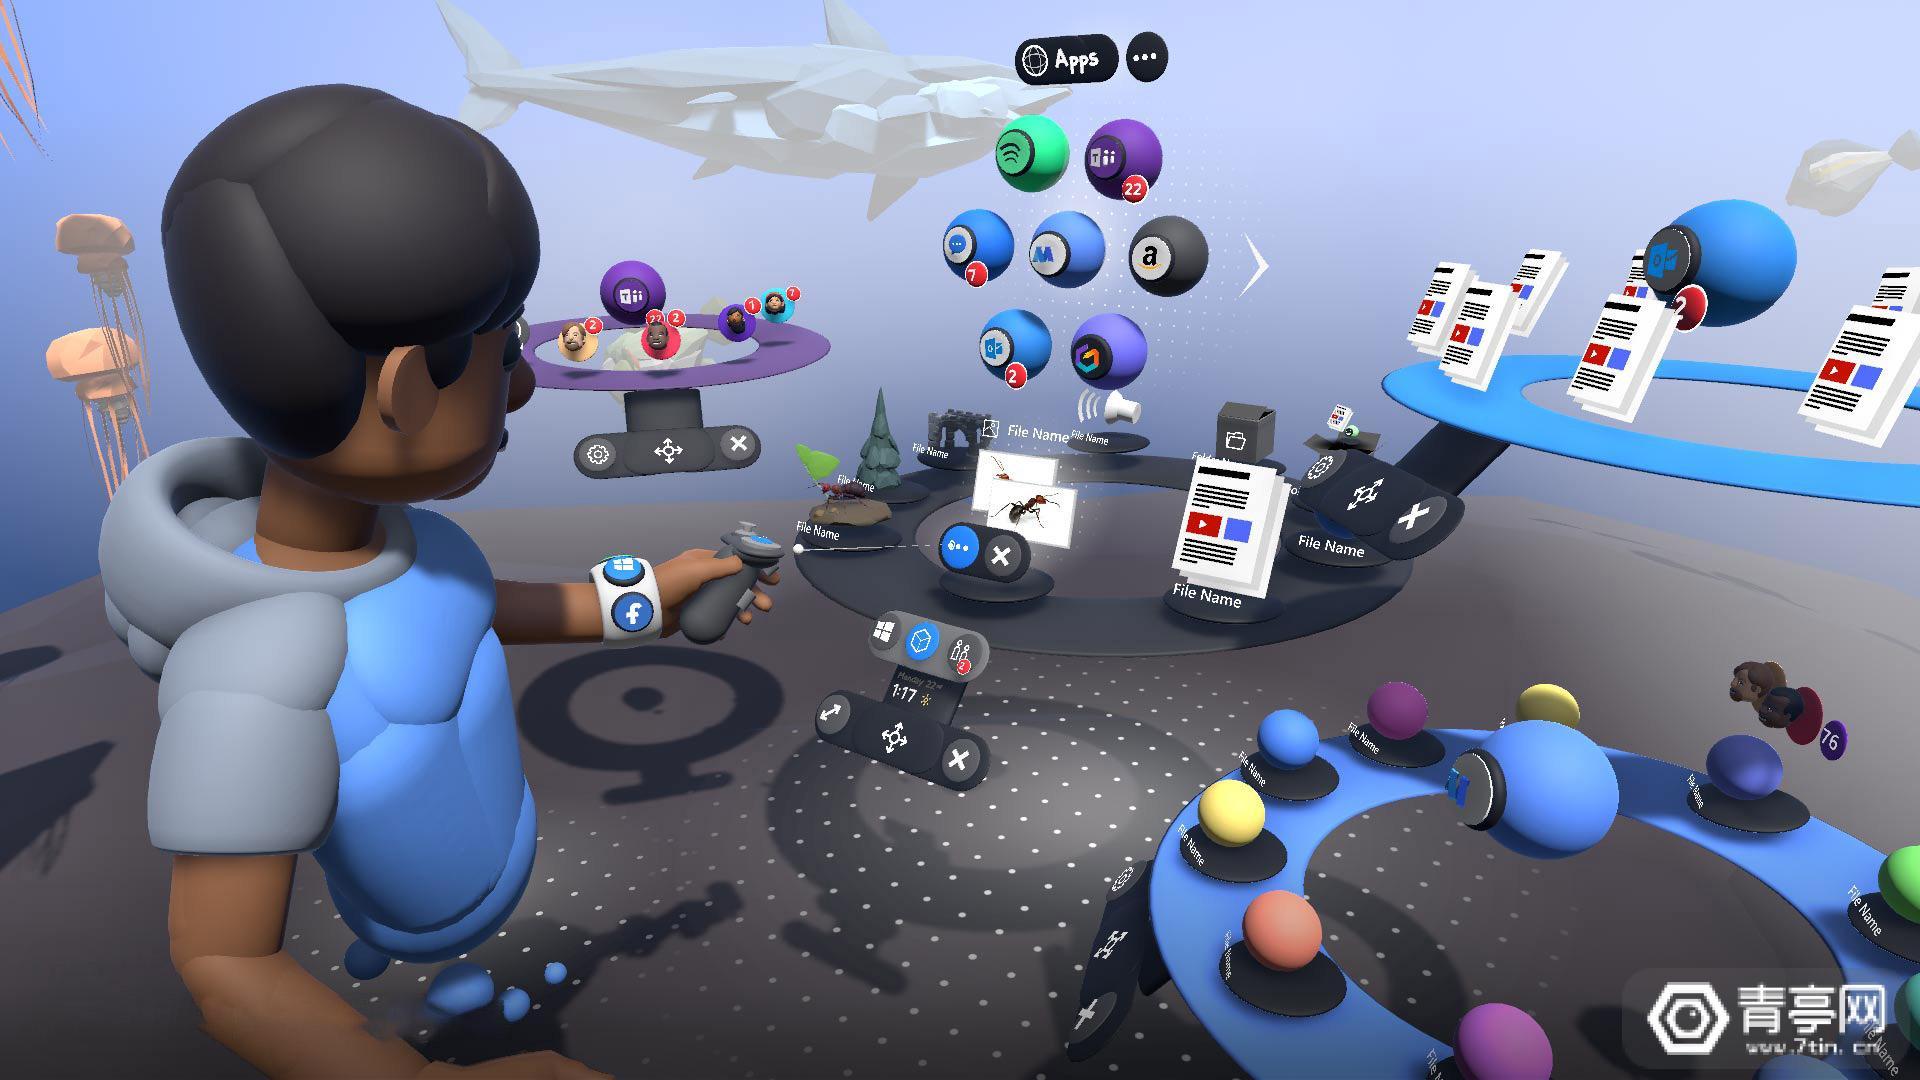 微软VR创作工具《Maquette》已登陆Steam平台